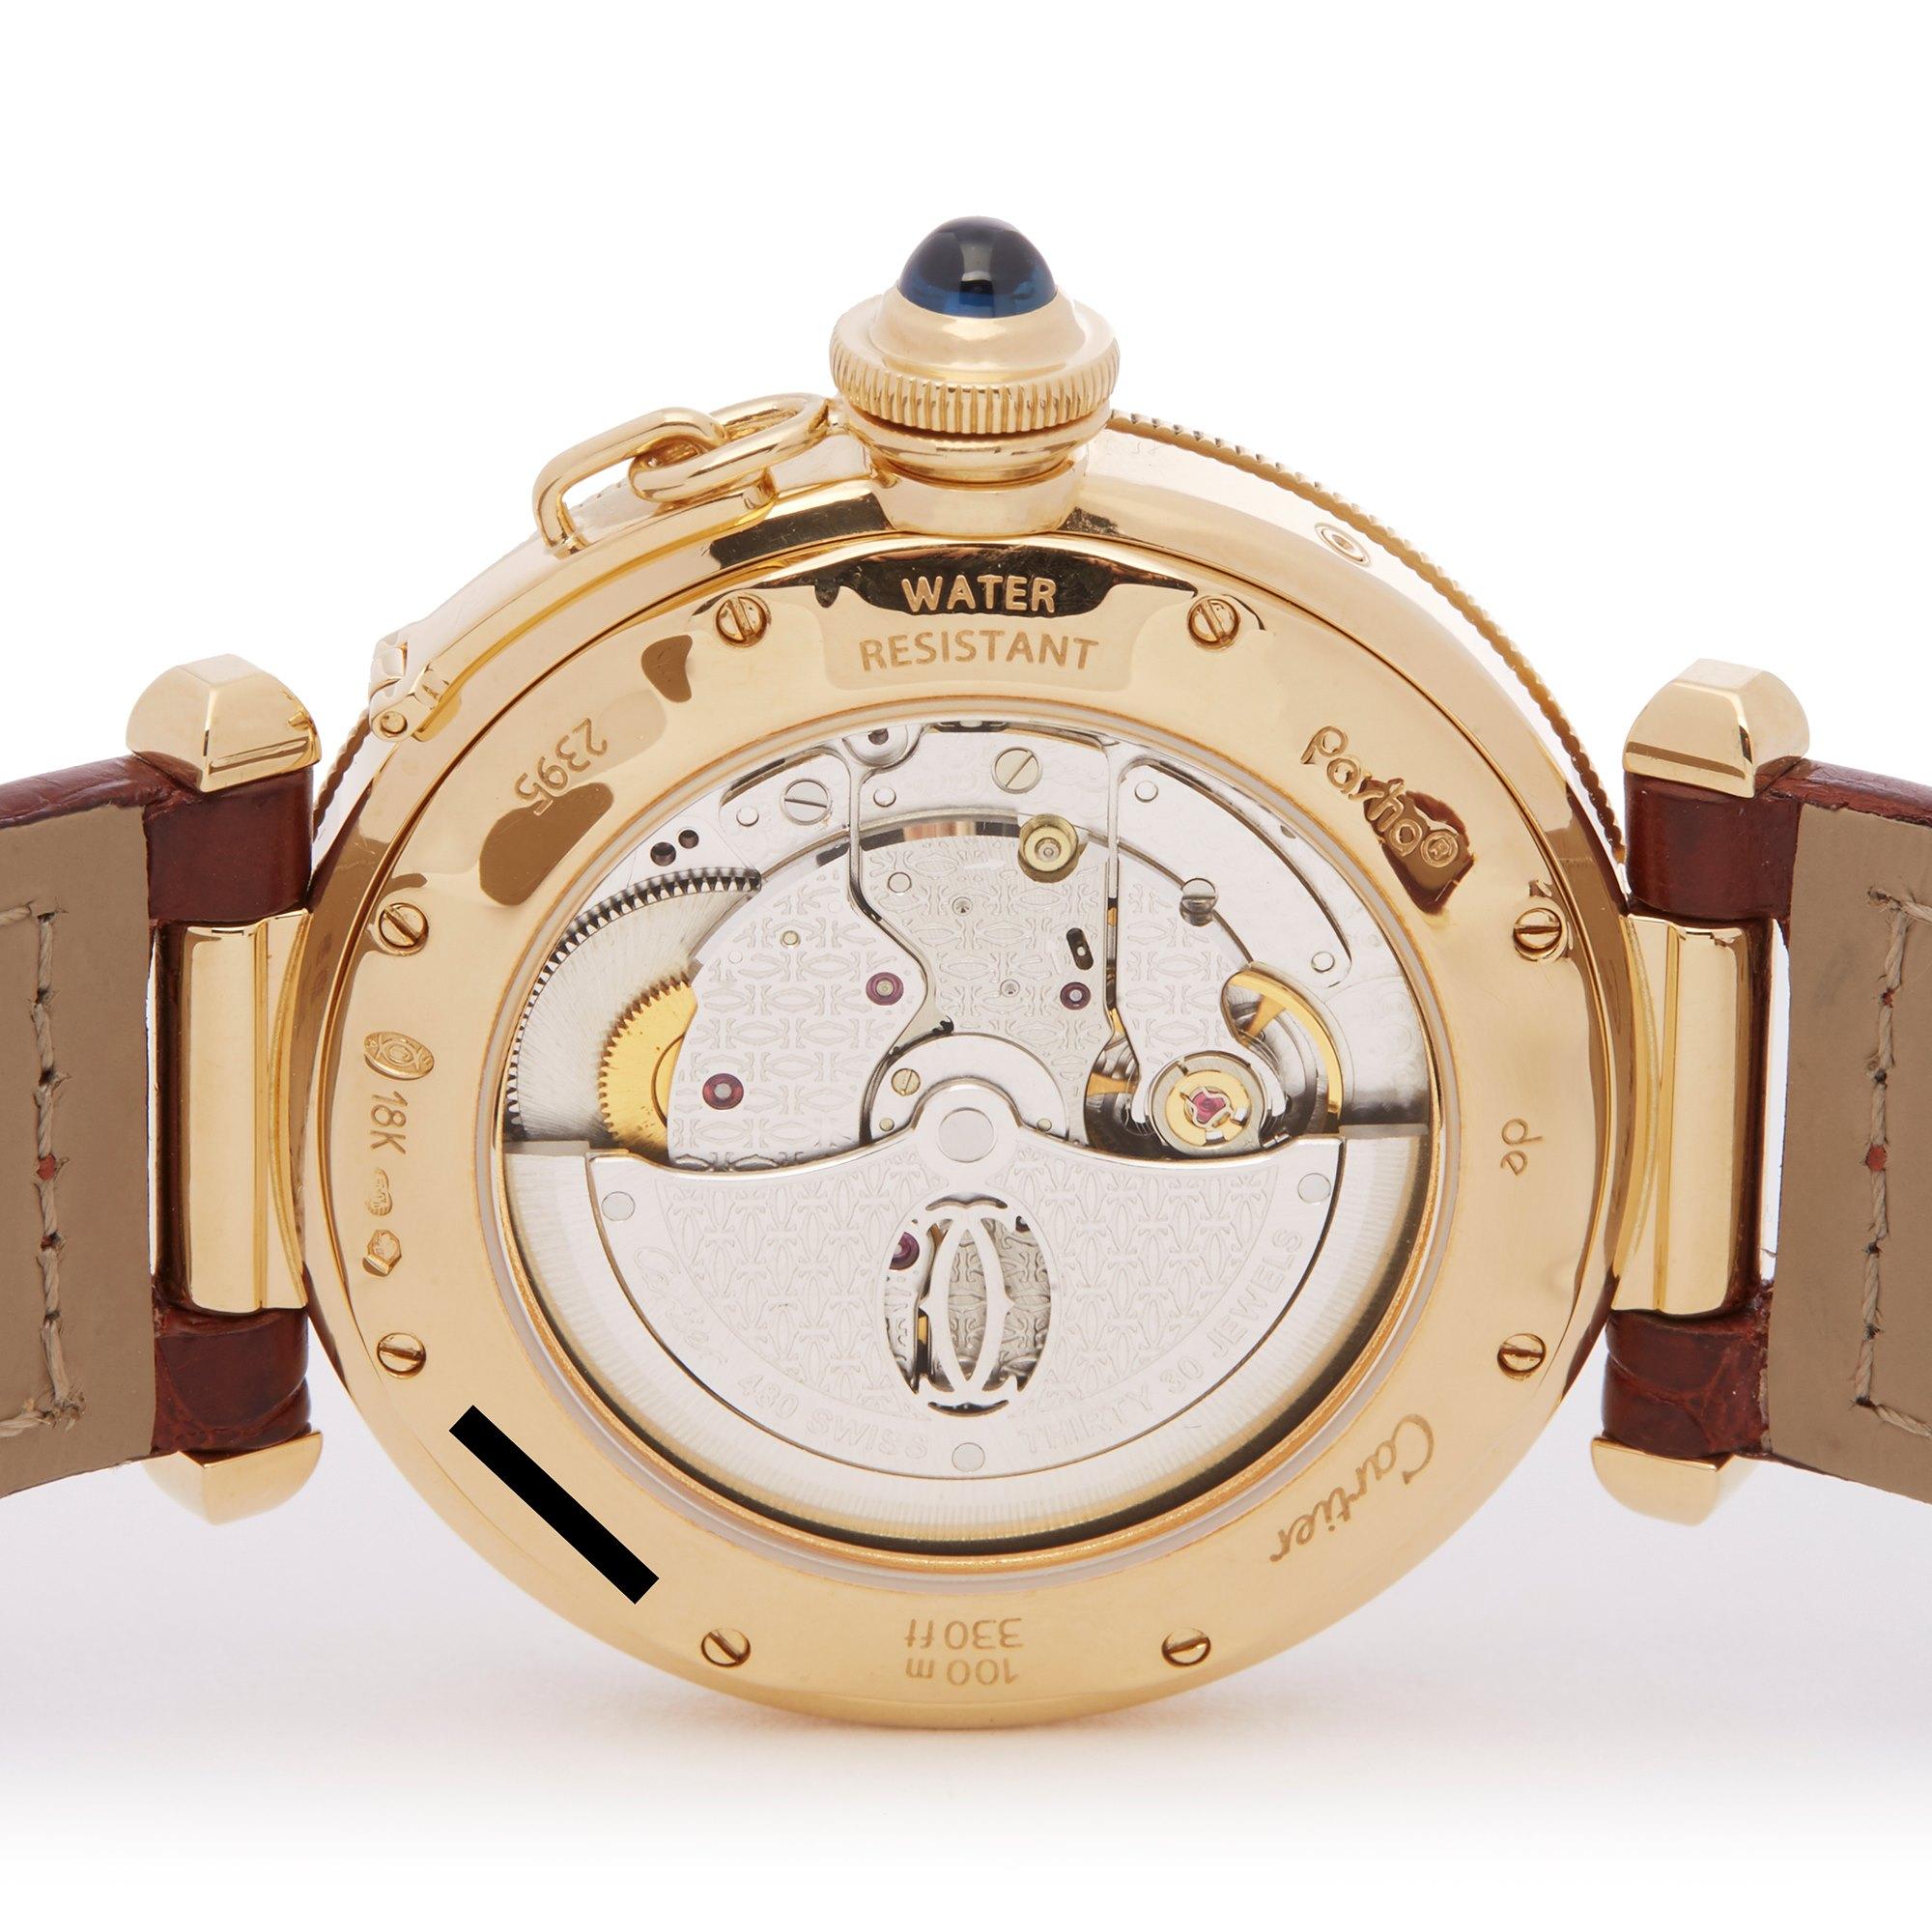 Cartier Pasha Seatimer 18K Geel Goud W3014456 or 2395